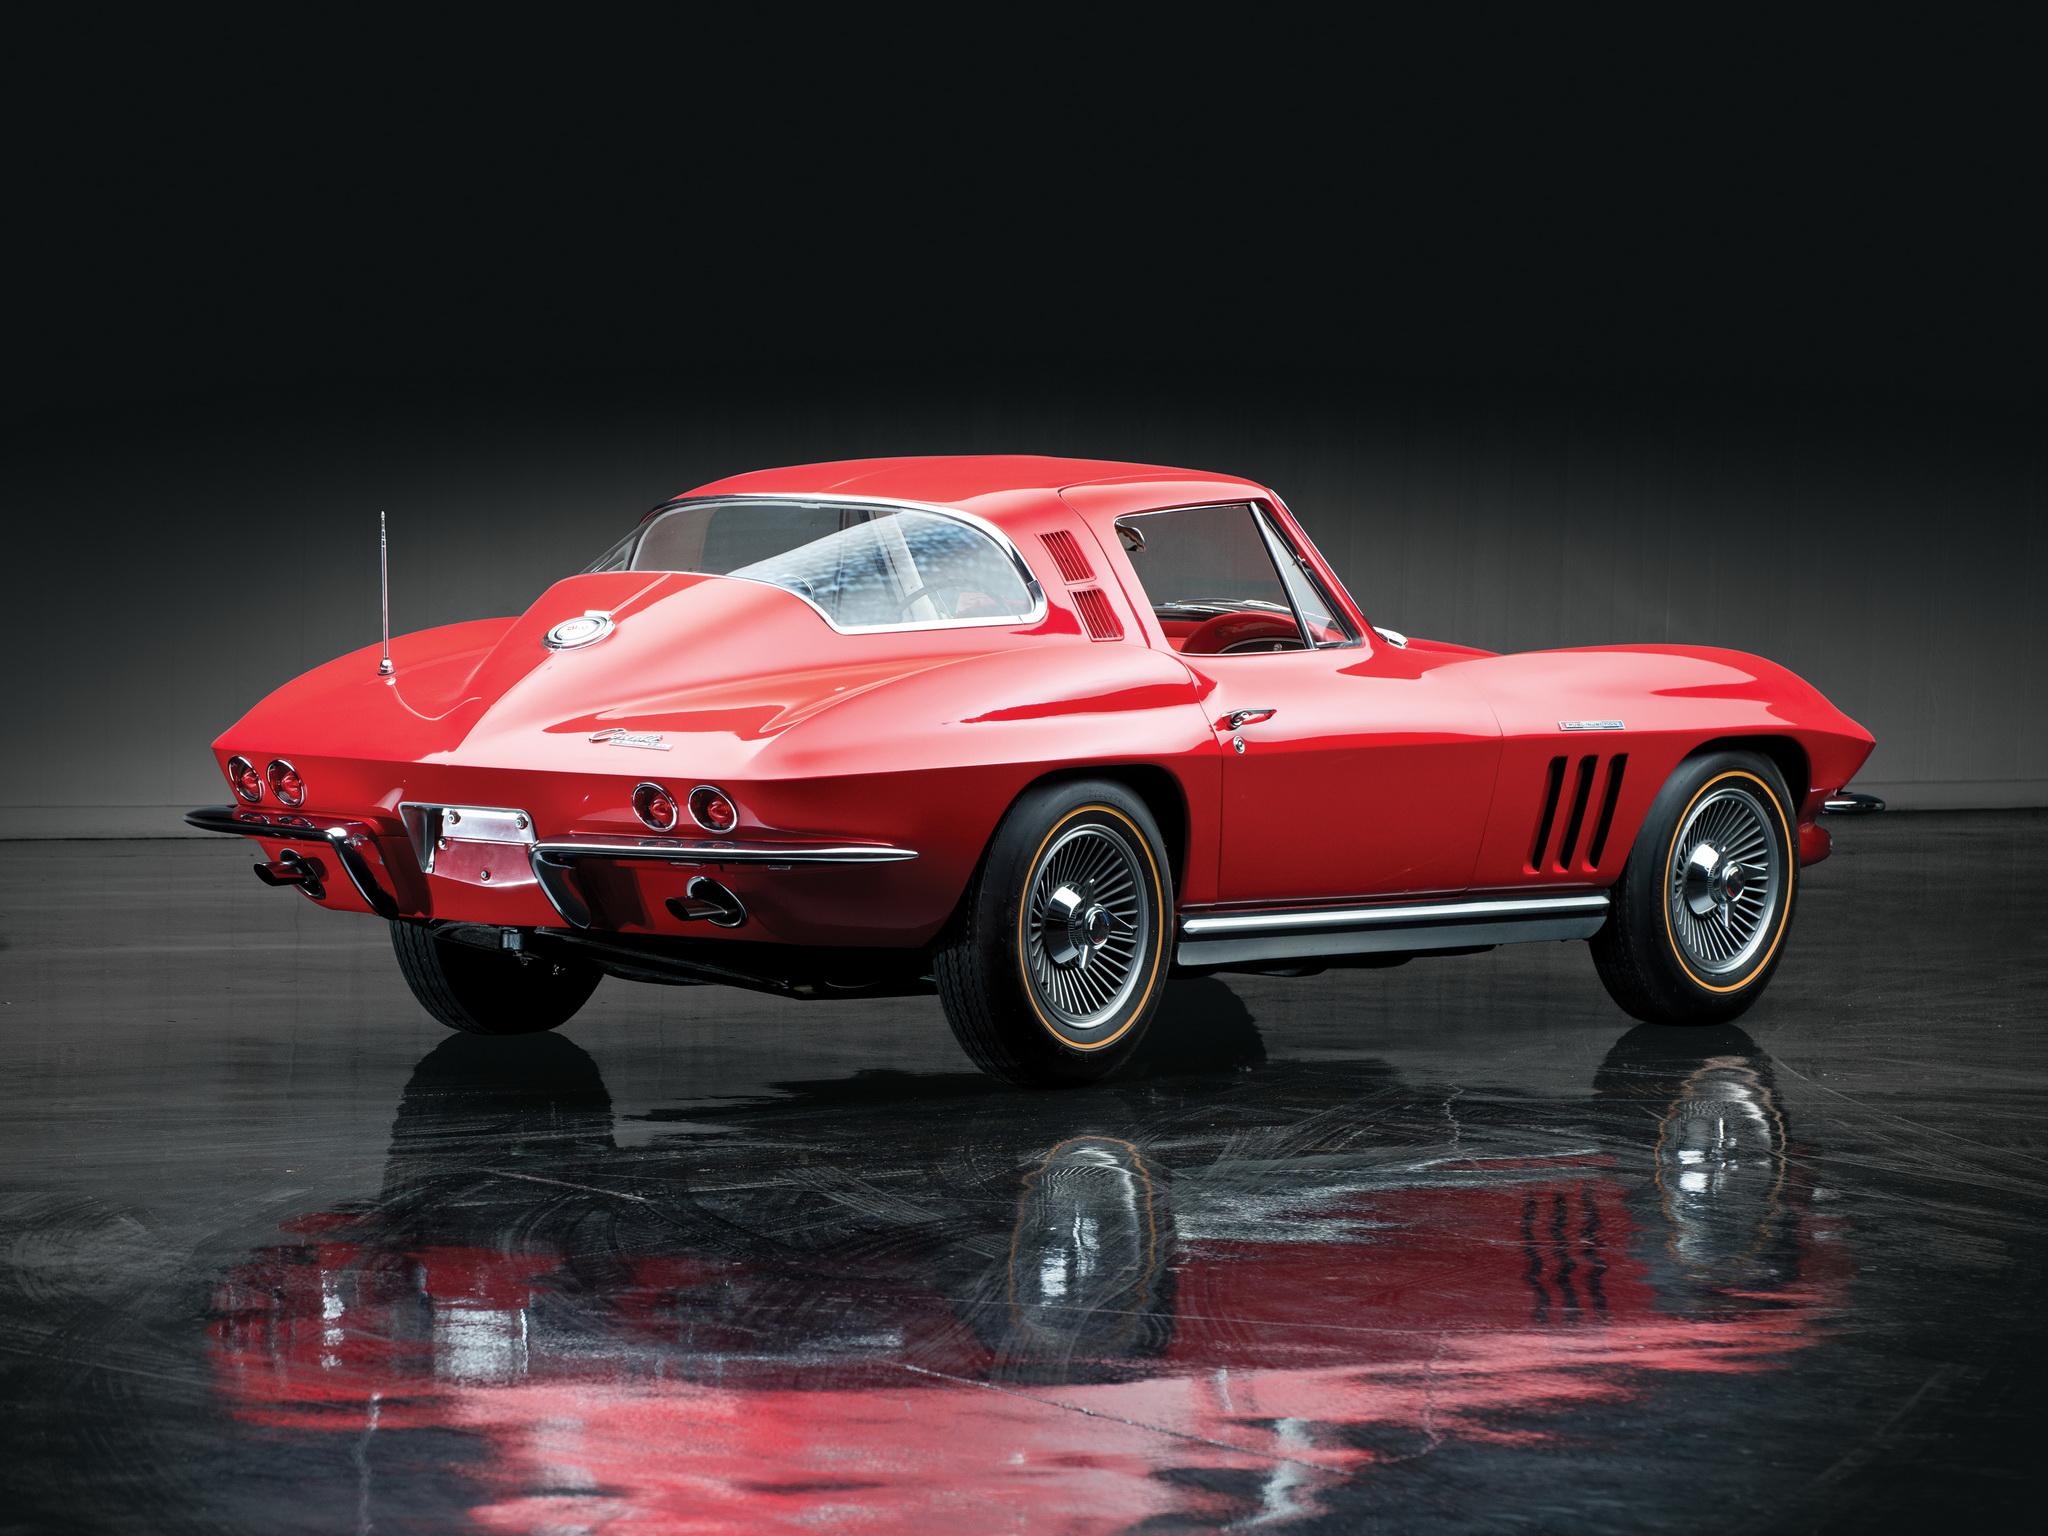 1965 corvette wallpaper - photo #25